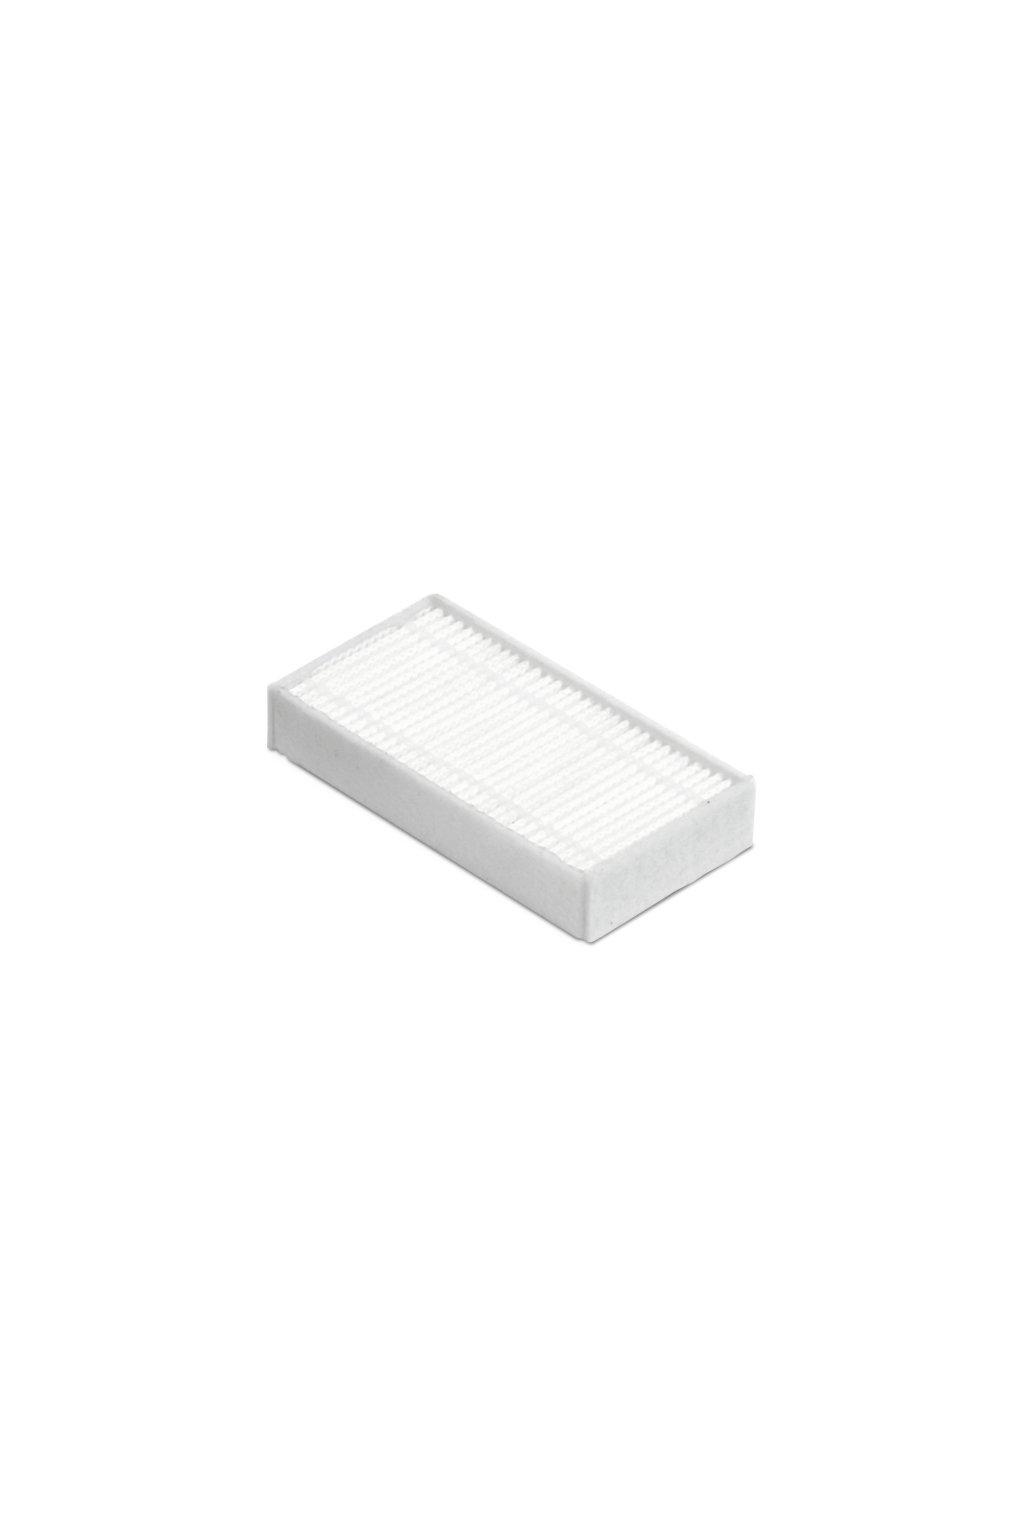 Roomy 4.0 hepa szűrő